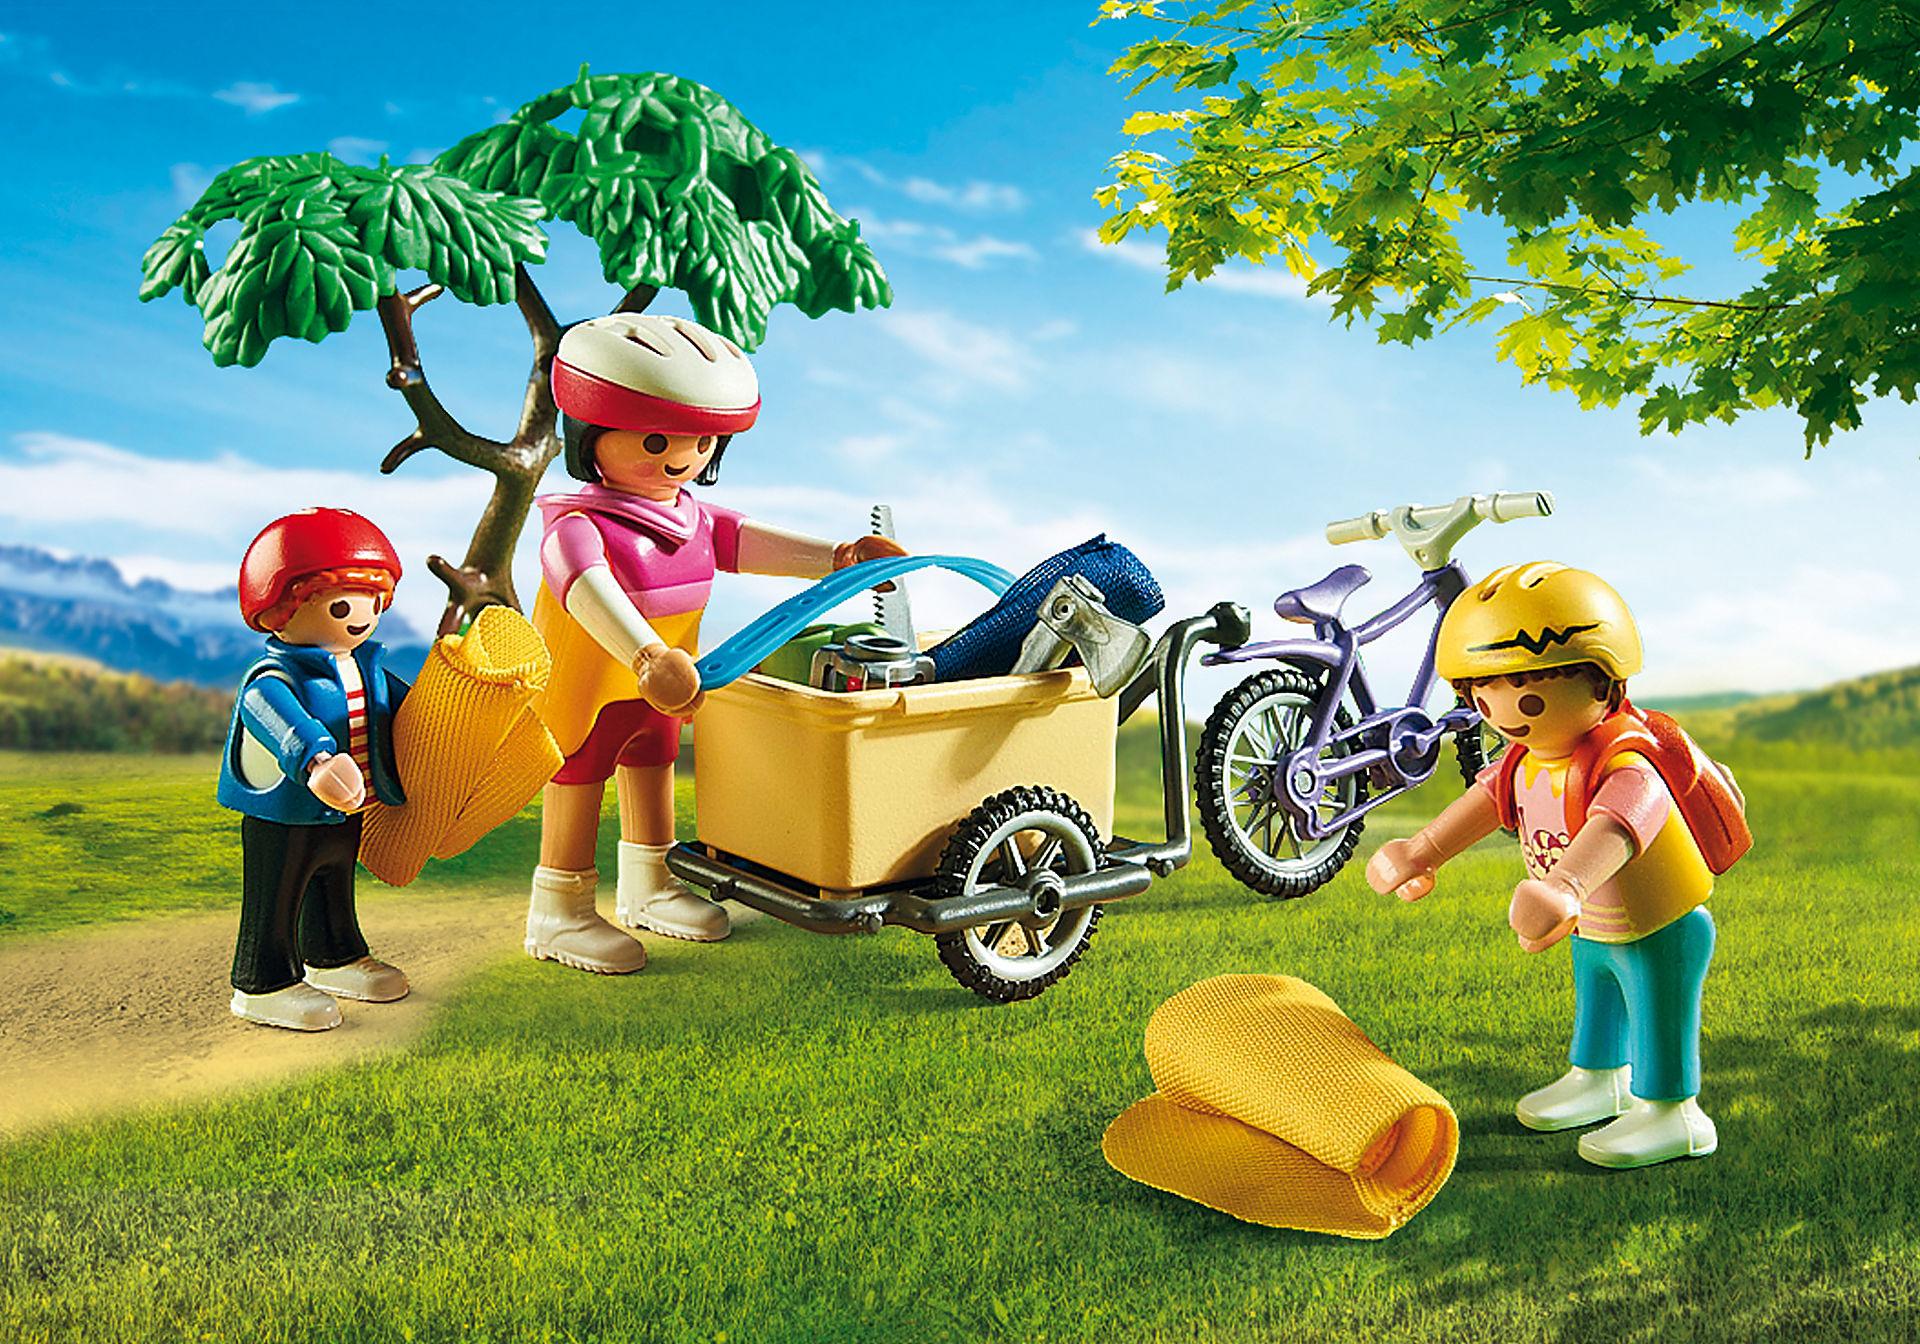 6890 Cyclistes avec vélos et remorque zoom image6